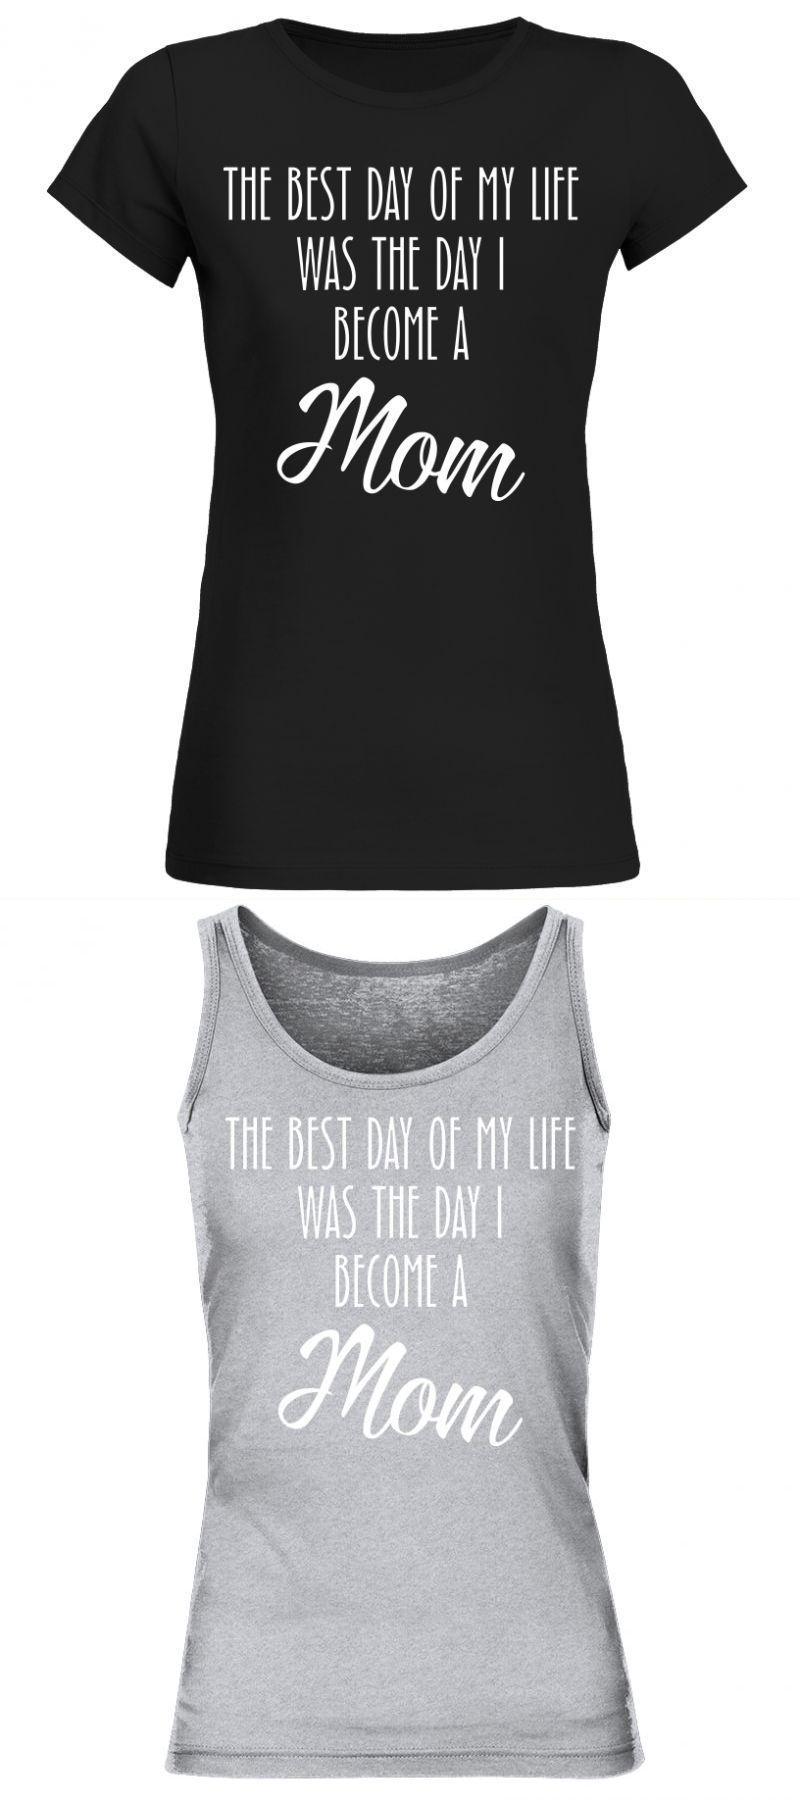 314e27e5 Couple t shirt best friend the best day mom family tshirt couple t-shirt  design